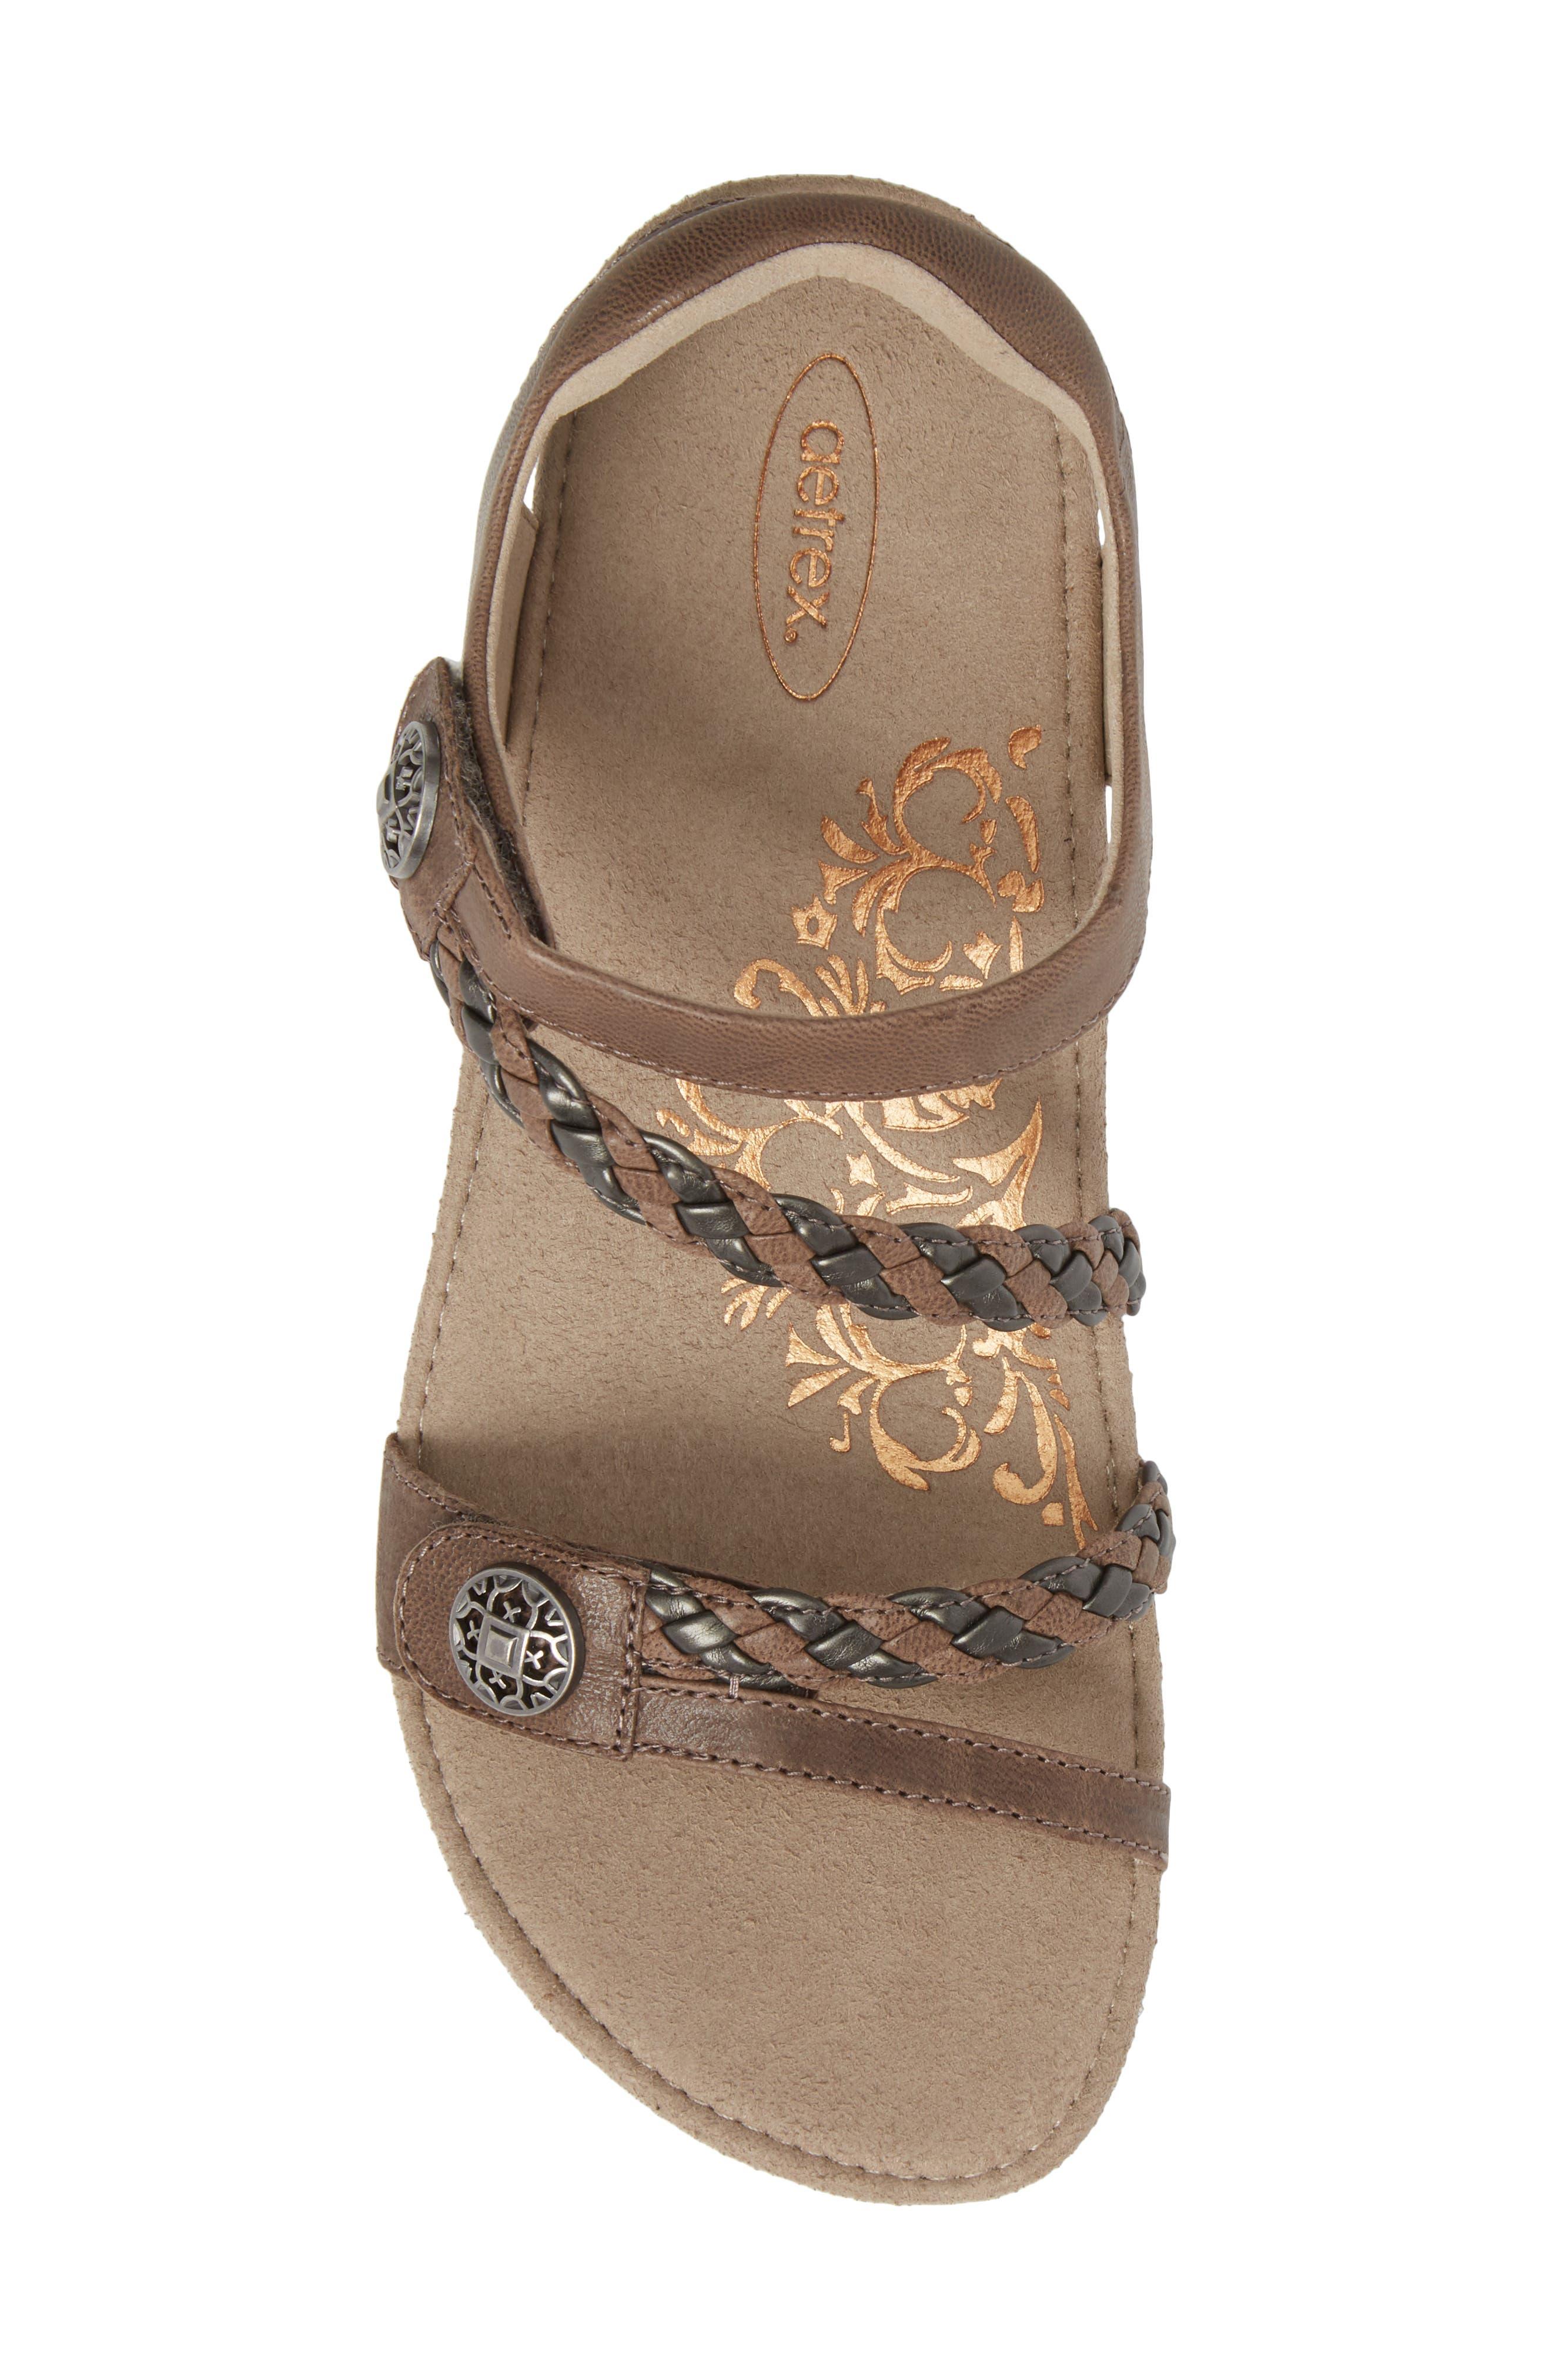 'Jillian' Braided Leather Strap Sandal,                             Alternate thumbnail 5, color,                             GREY LEATHER